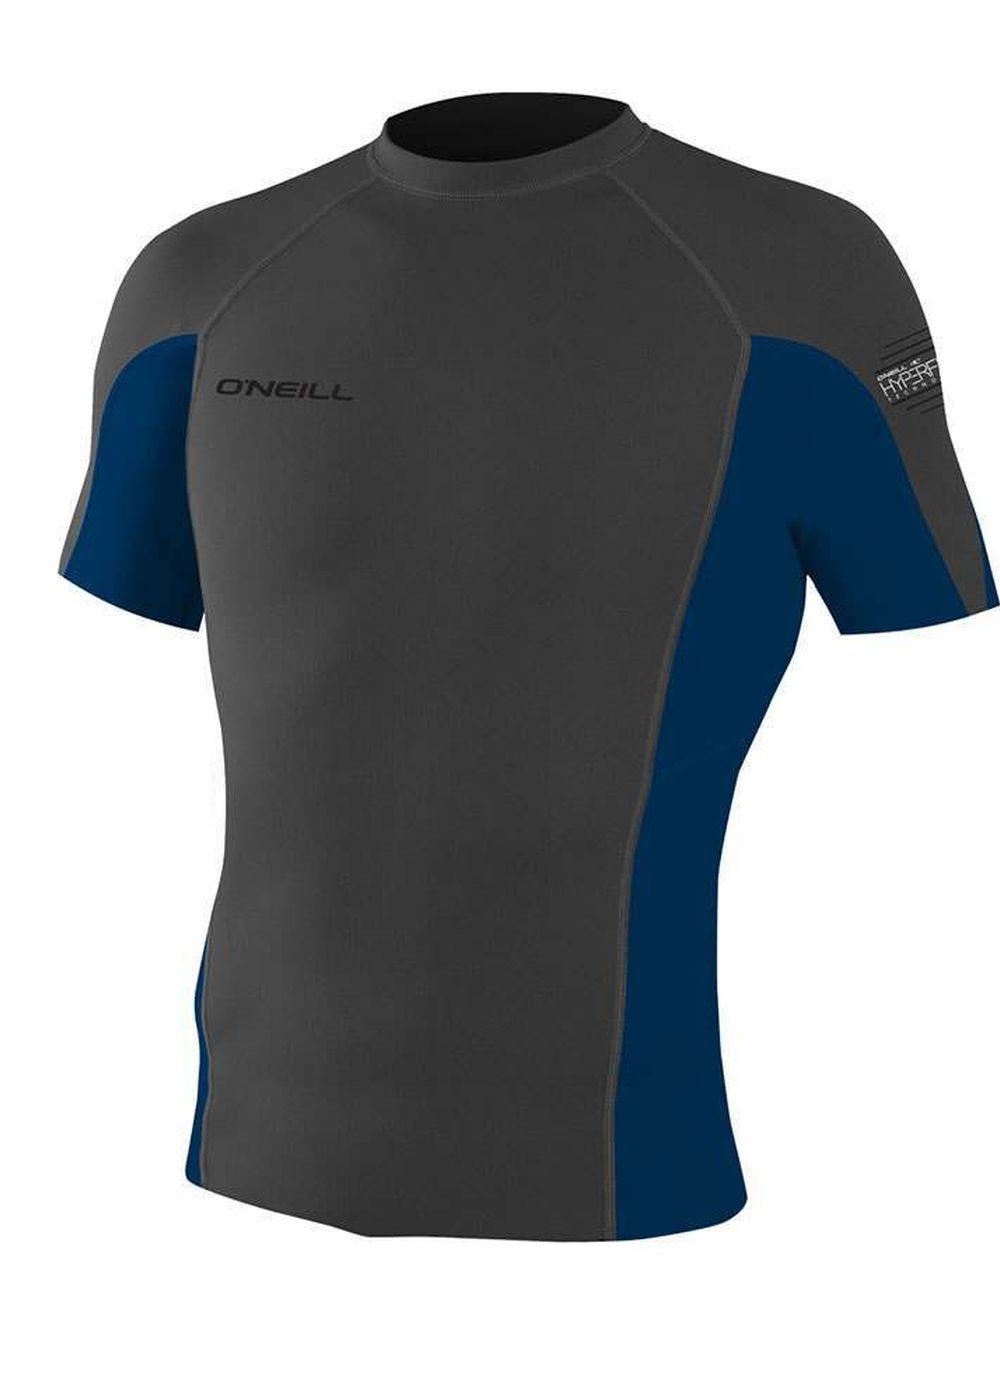 Oneill Hyperfreak 0.5mm Short Sleeve Wetsuit Top Graphite Picture